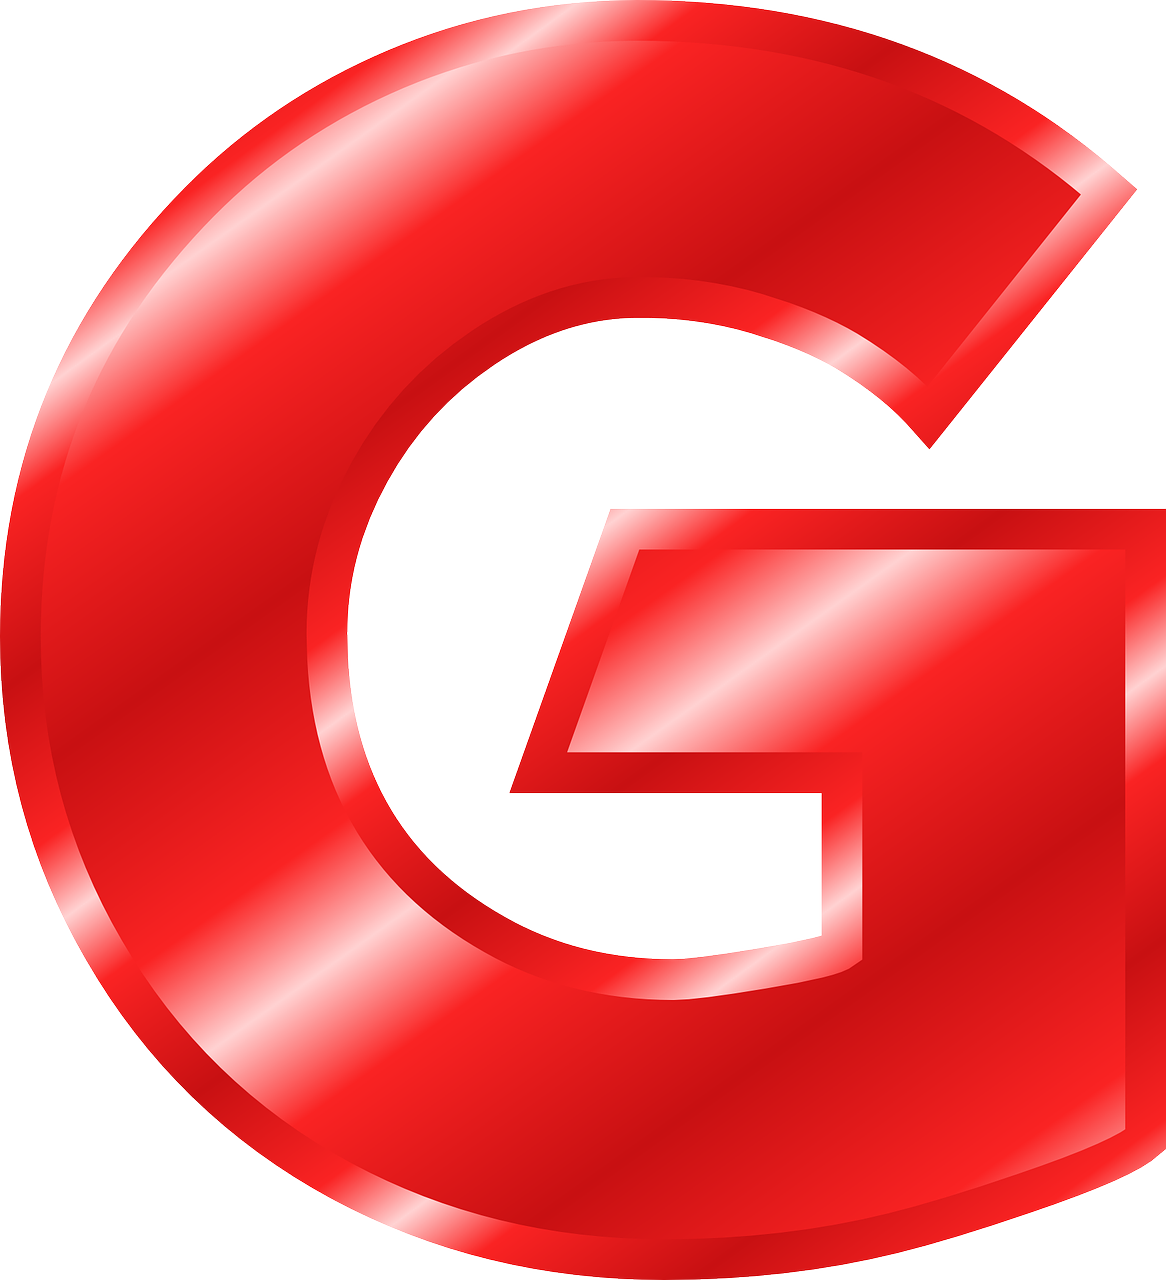 Letra G red bg